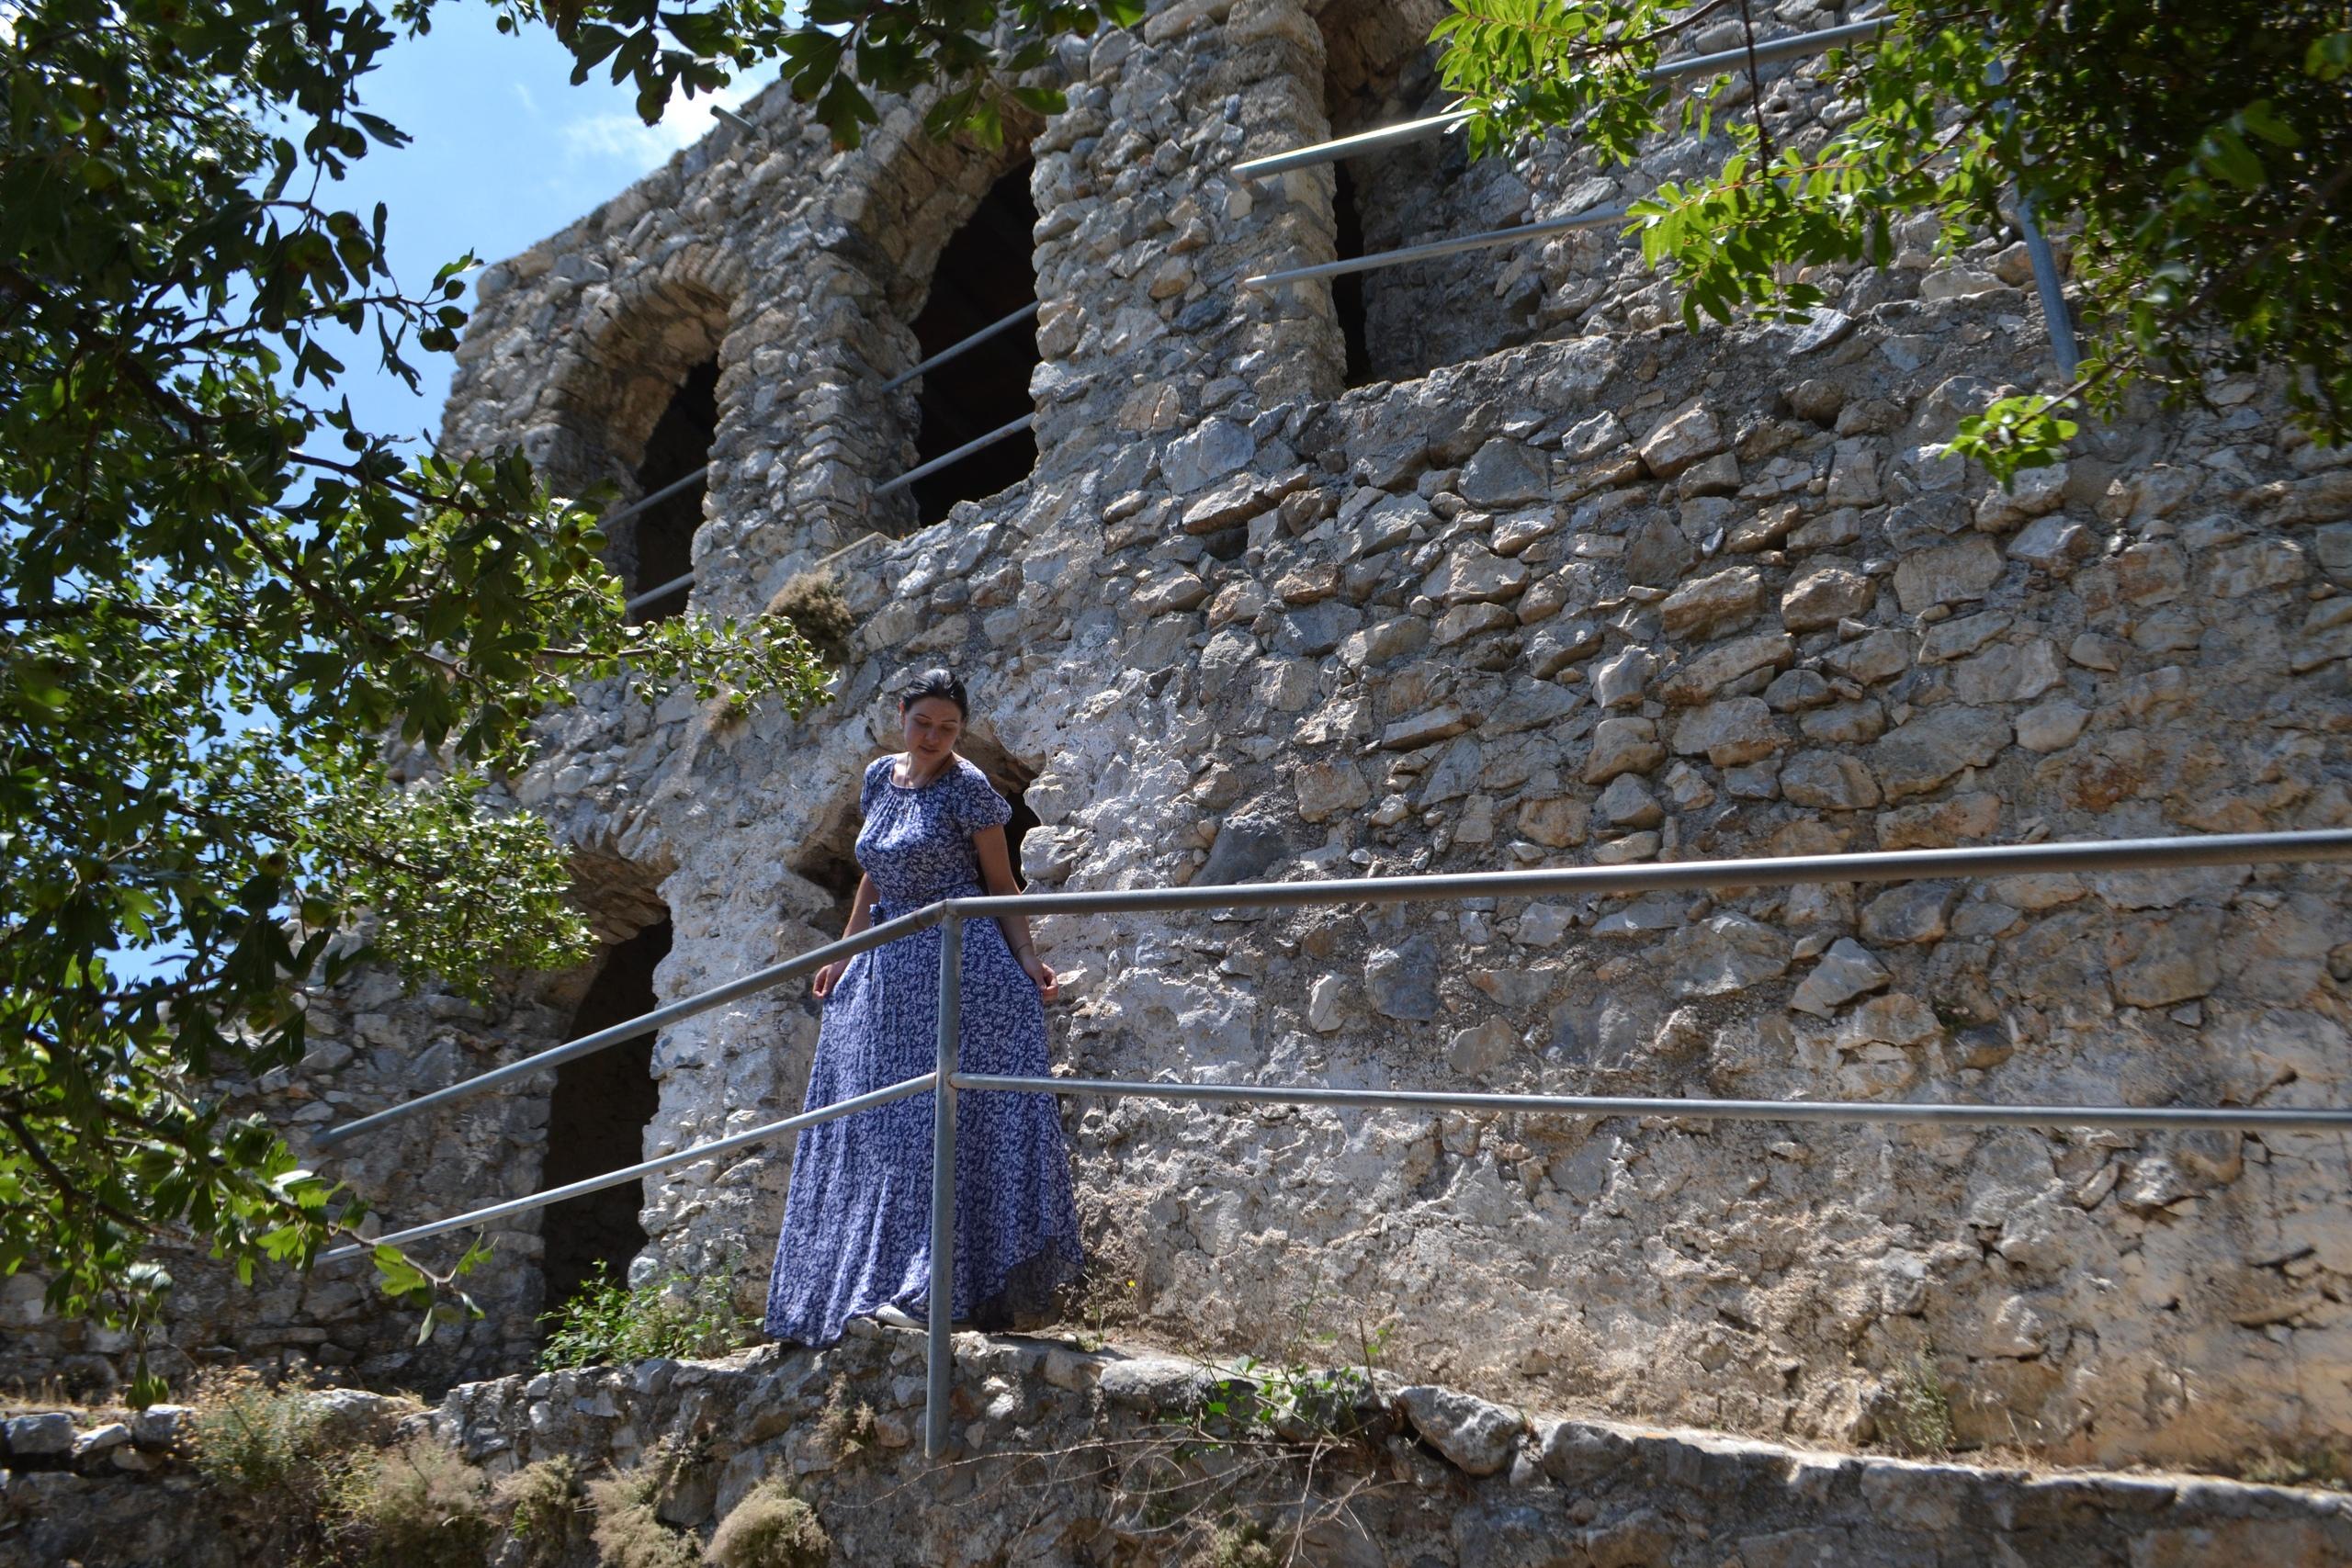 Северный Кипр. Замок Святого Иллариона. (фото). 4VZhTSk_LJA